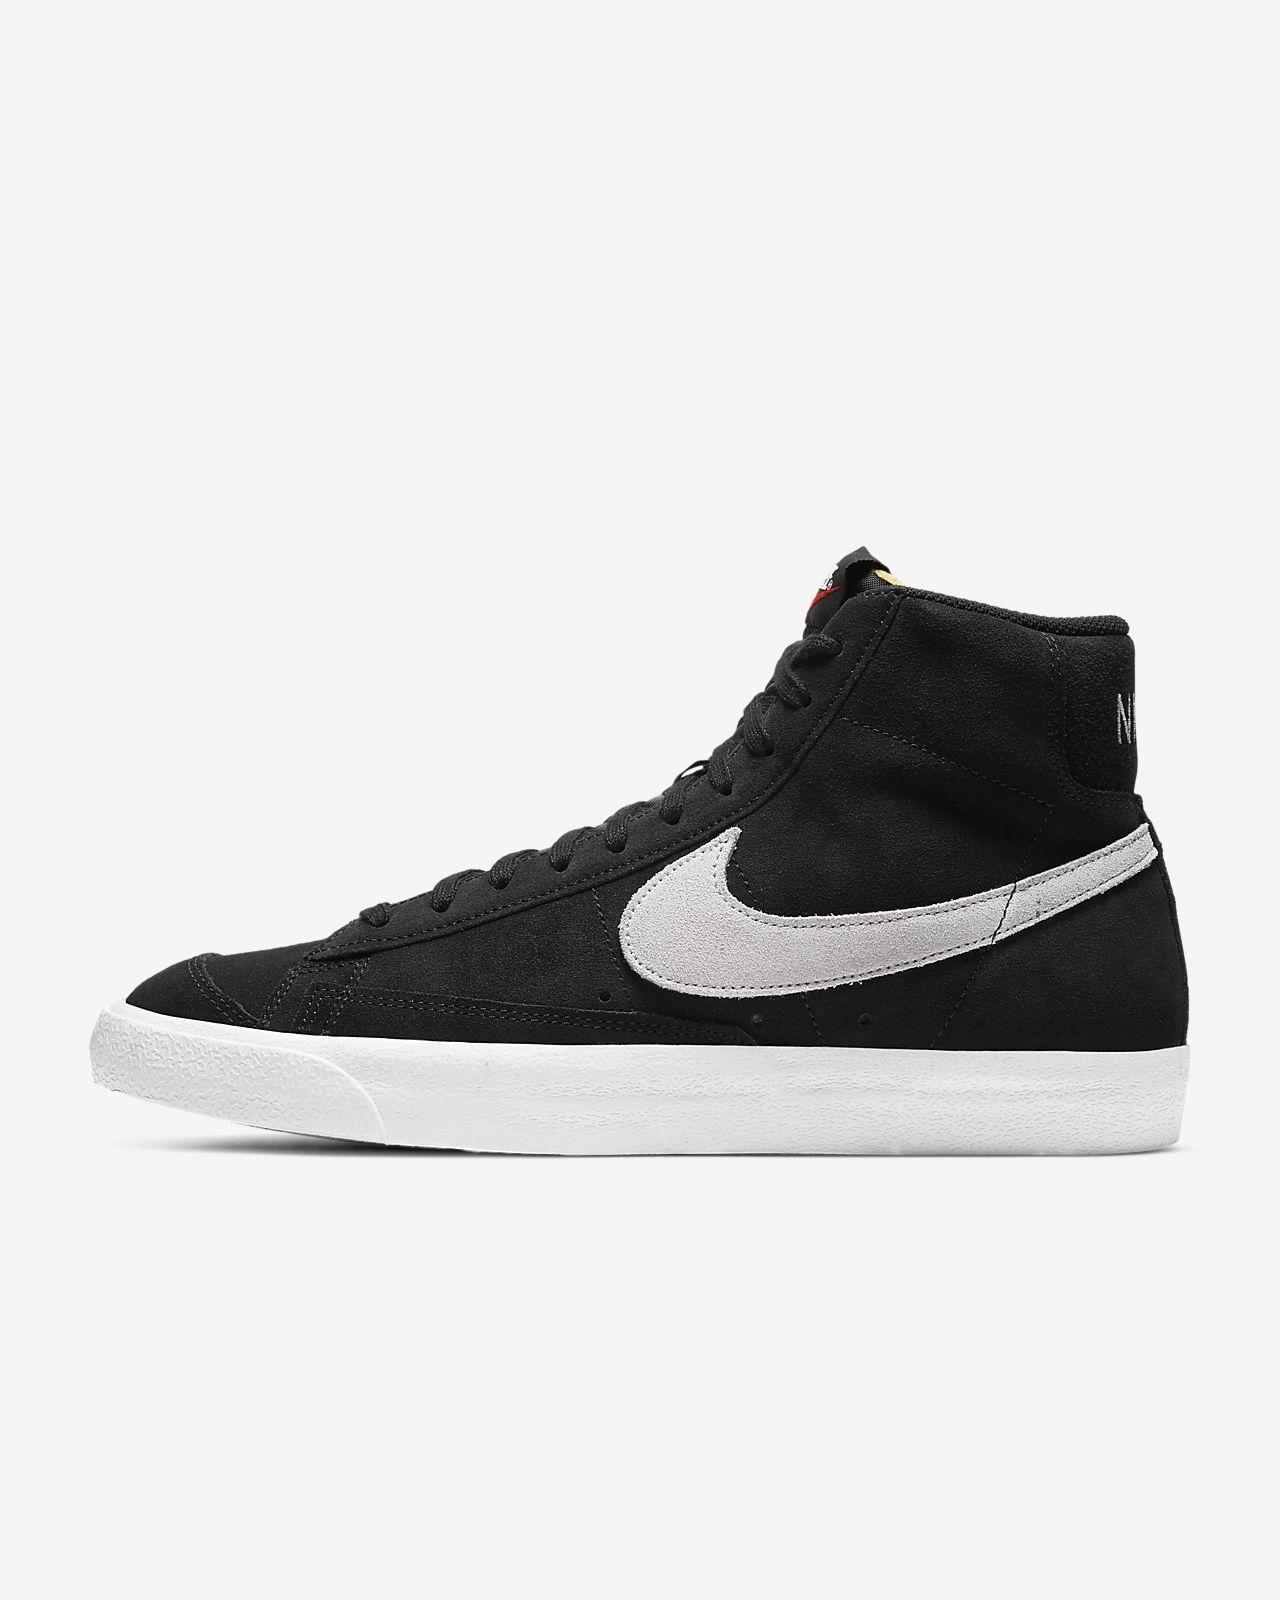 Nike Blazer 中筒 '77 麂皮鞋款